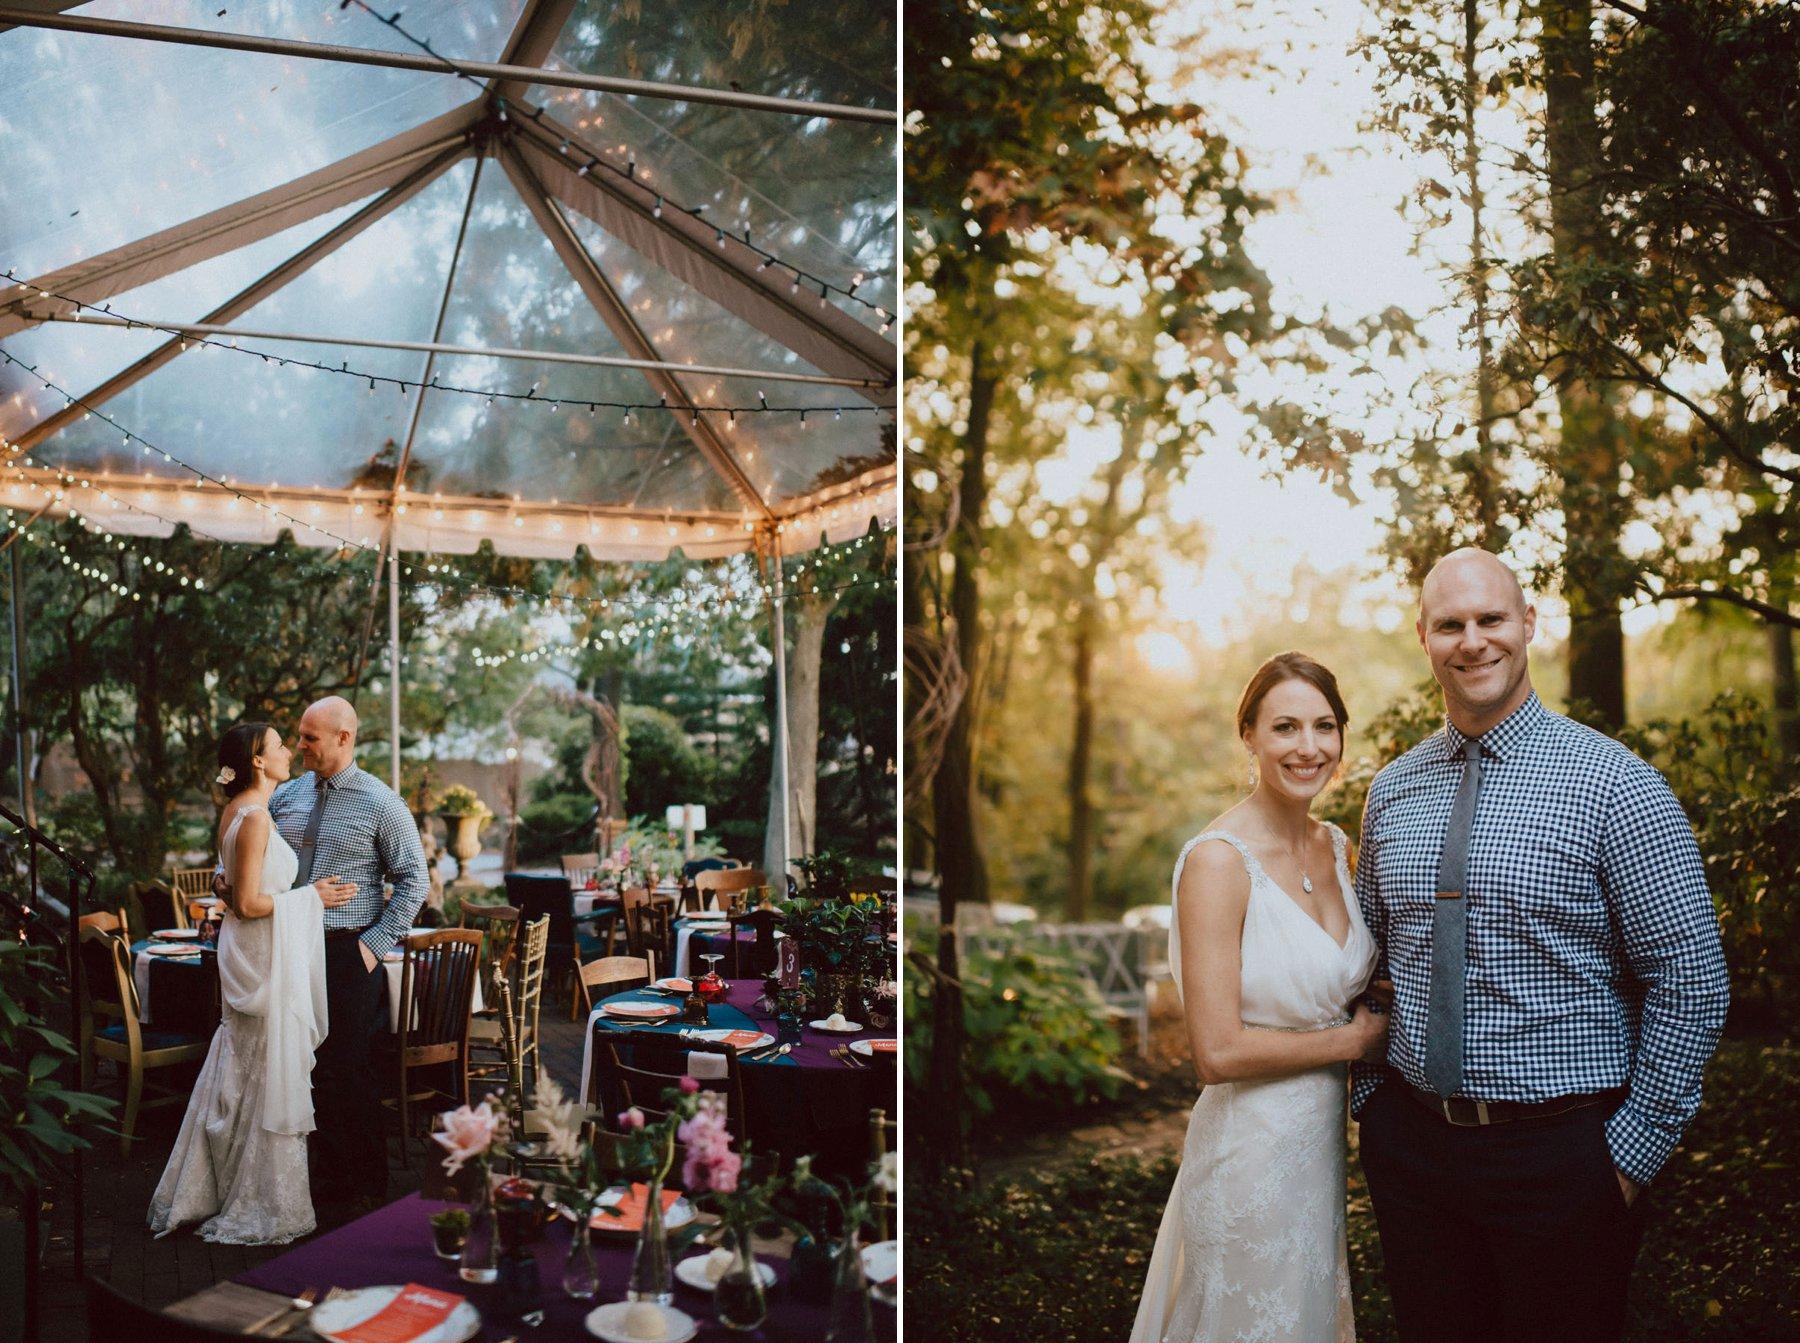 faunbrook-bed-and-breakfast-wedding-121.jpg